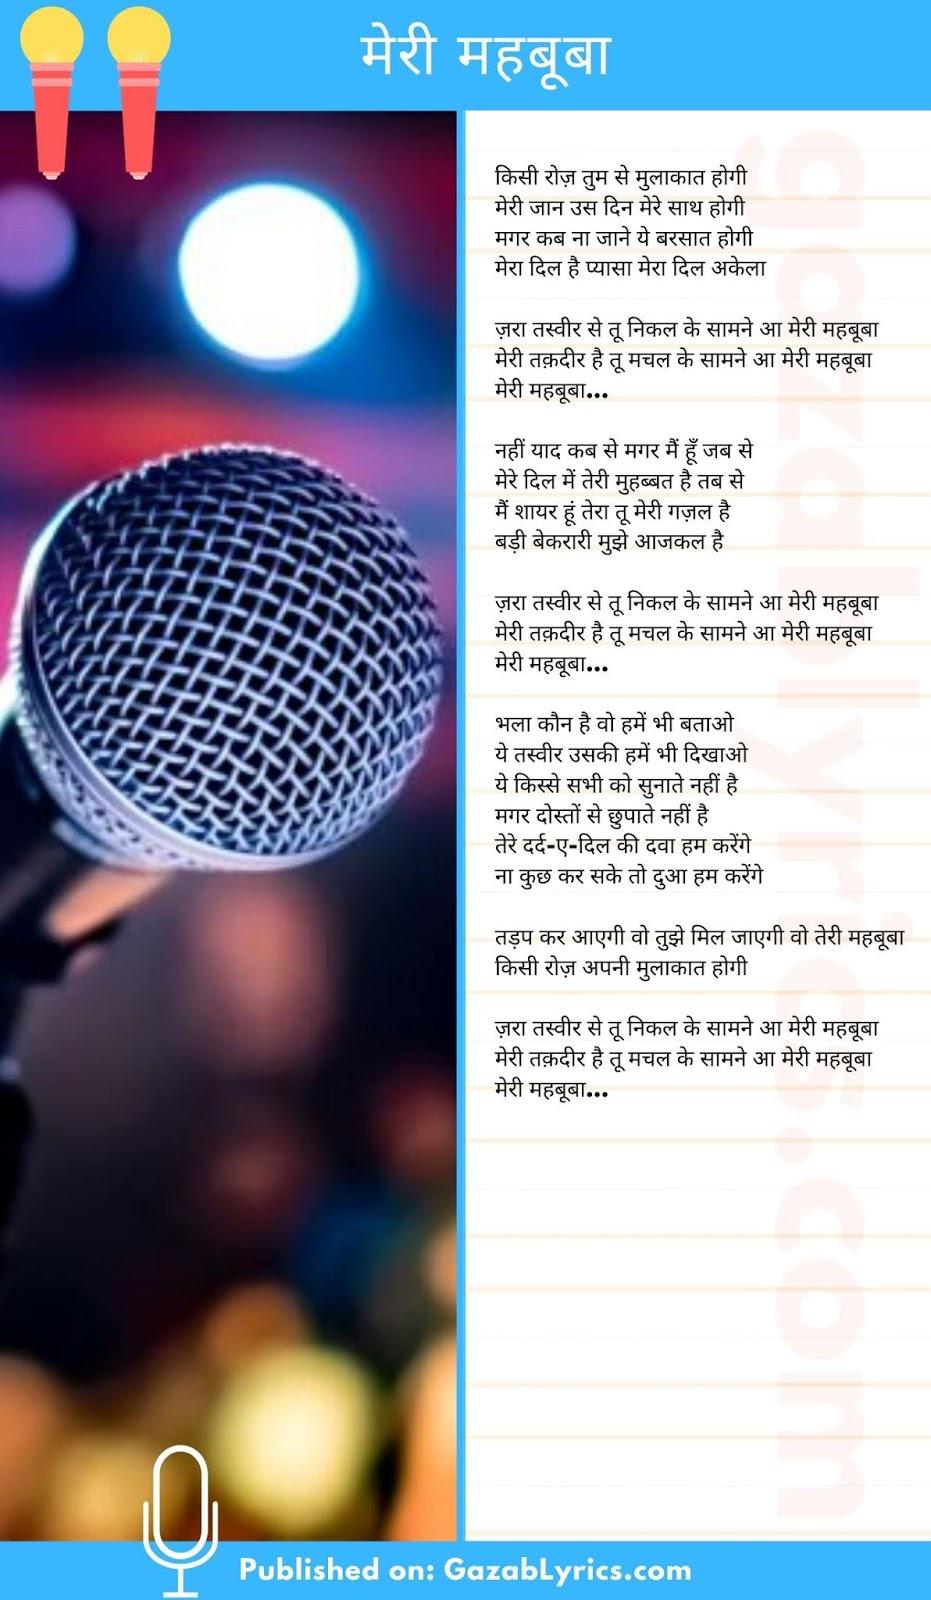 Zara Tasveer Se Tu song lyrics image